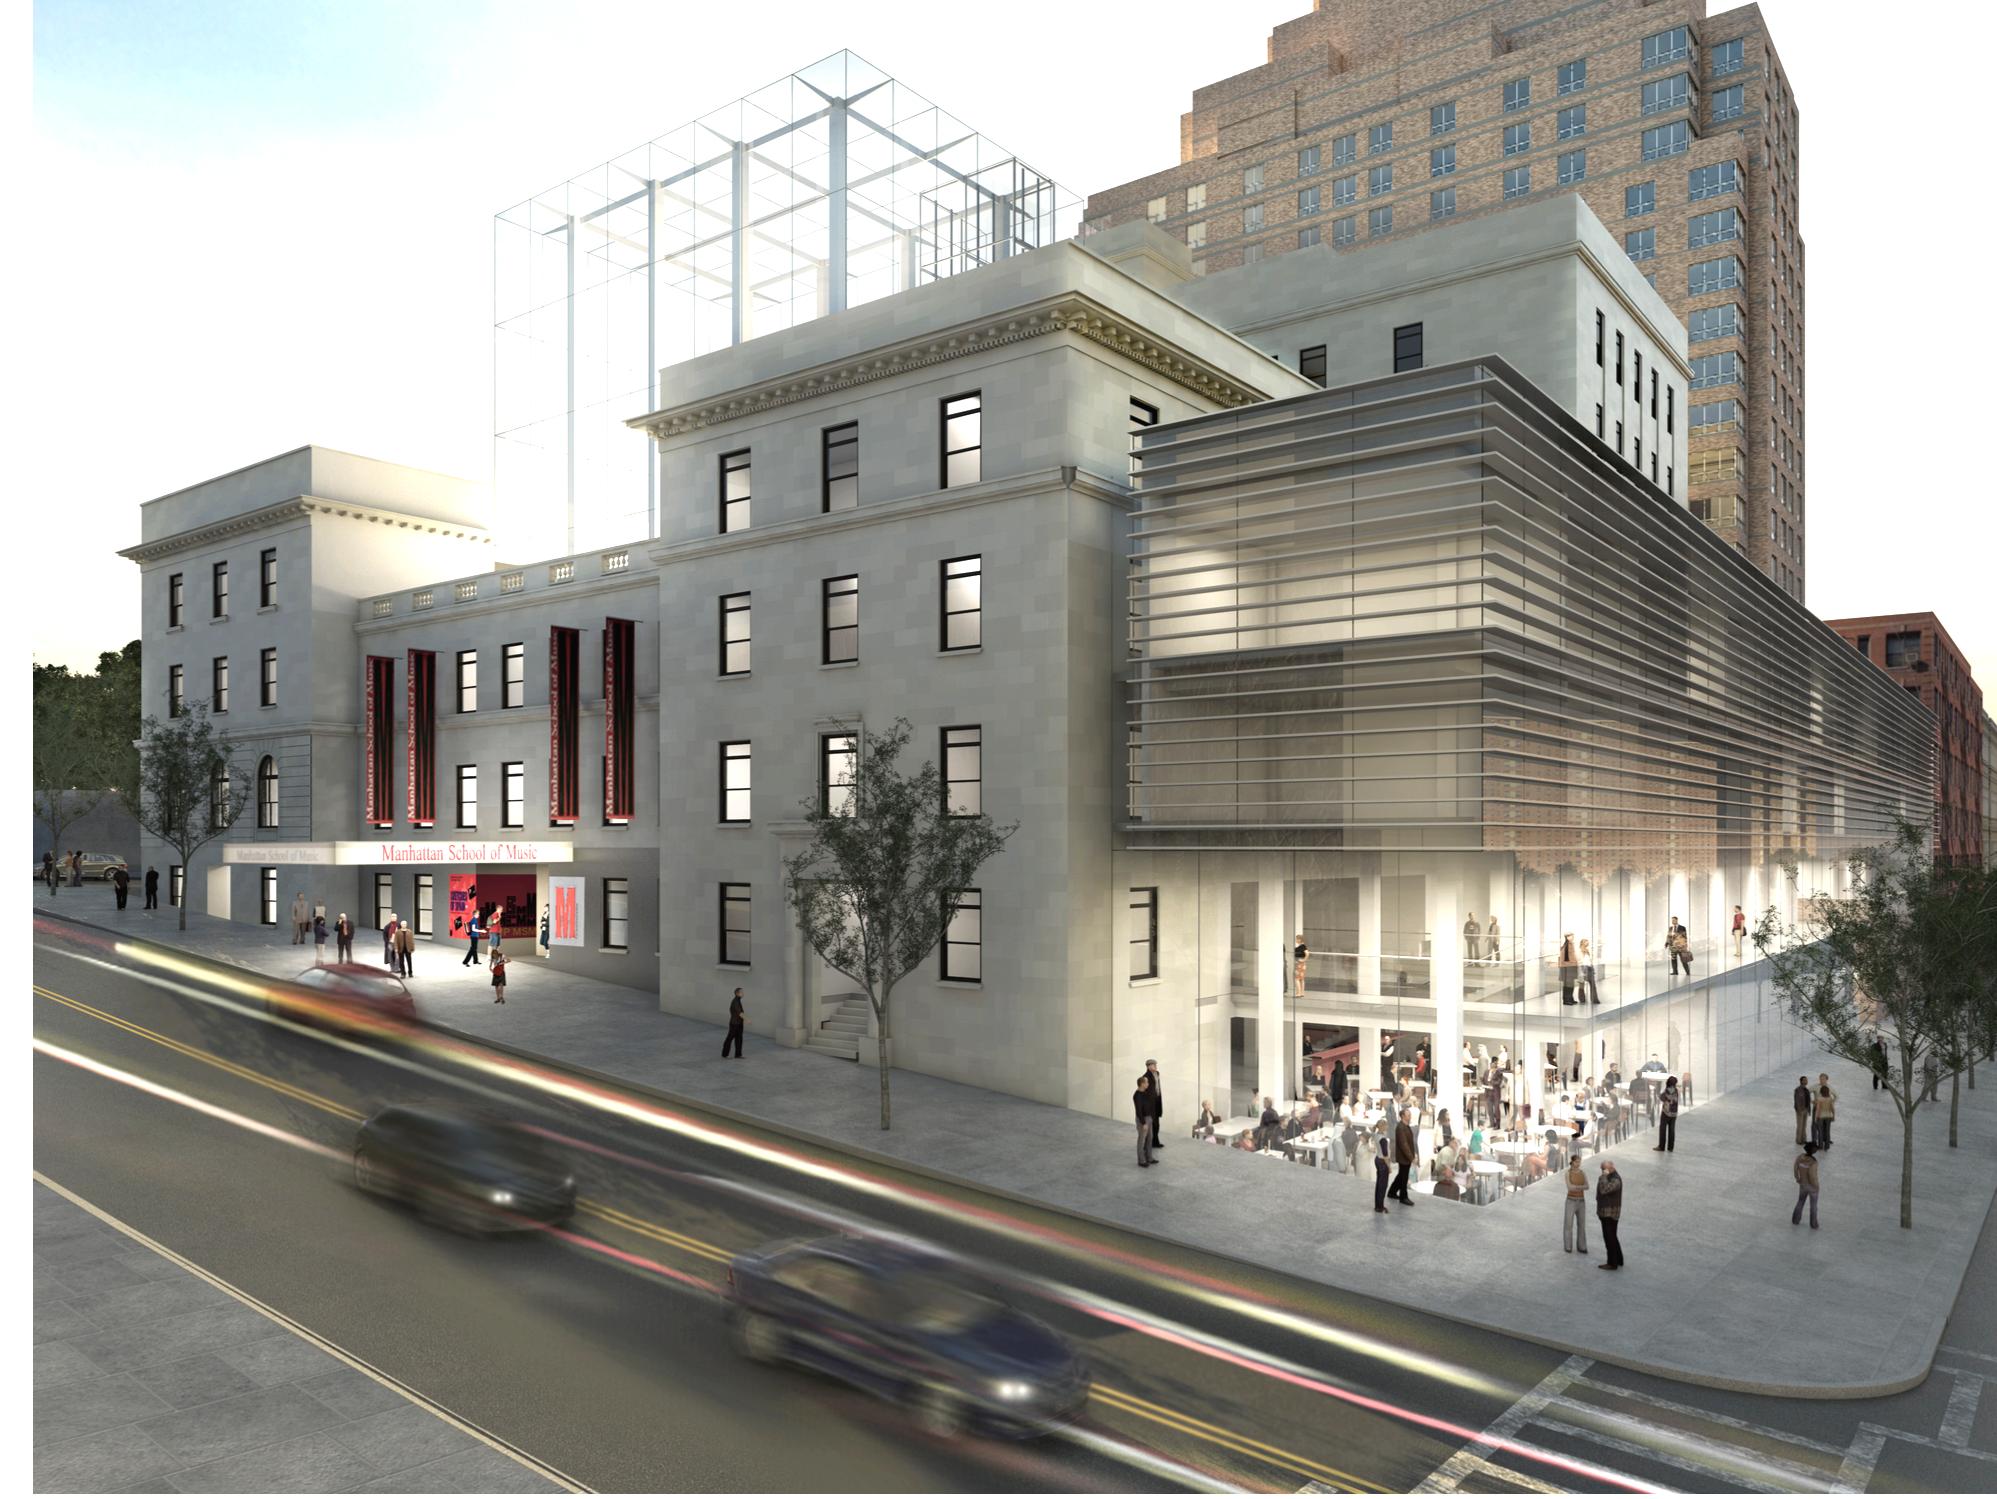 Manhattan School of Music, New York, NY*